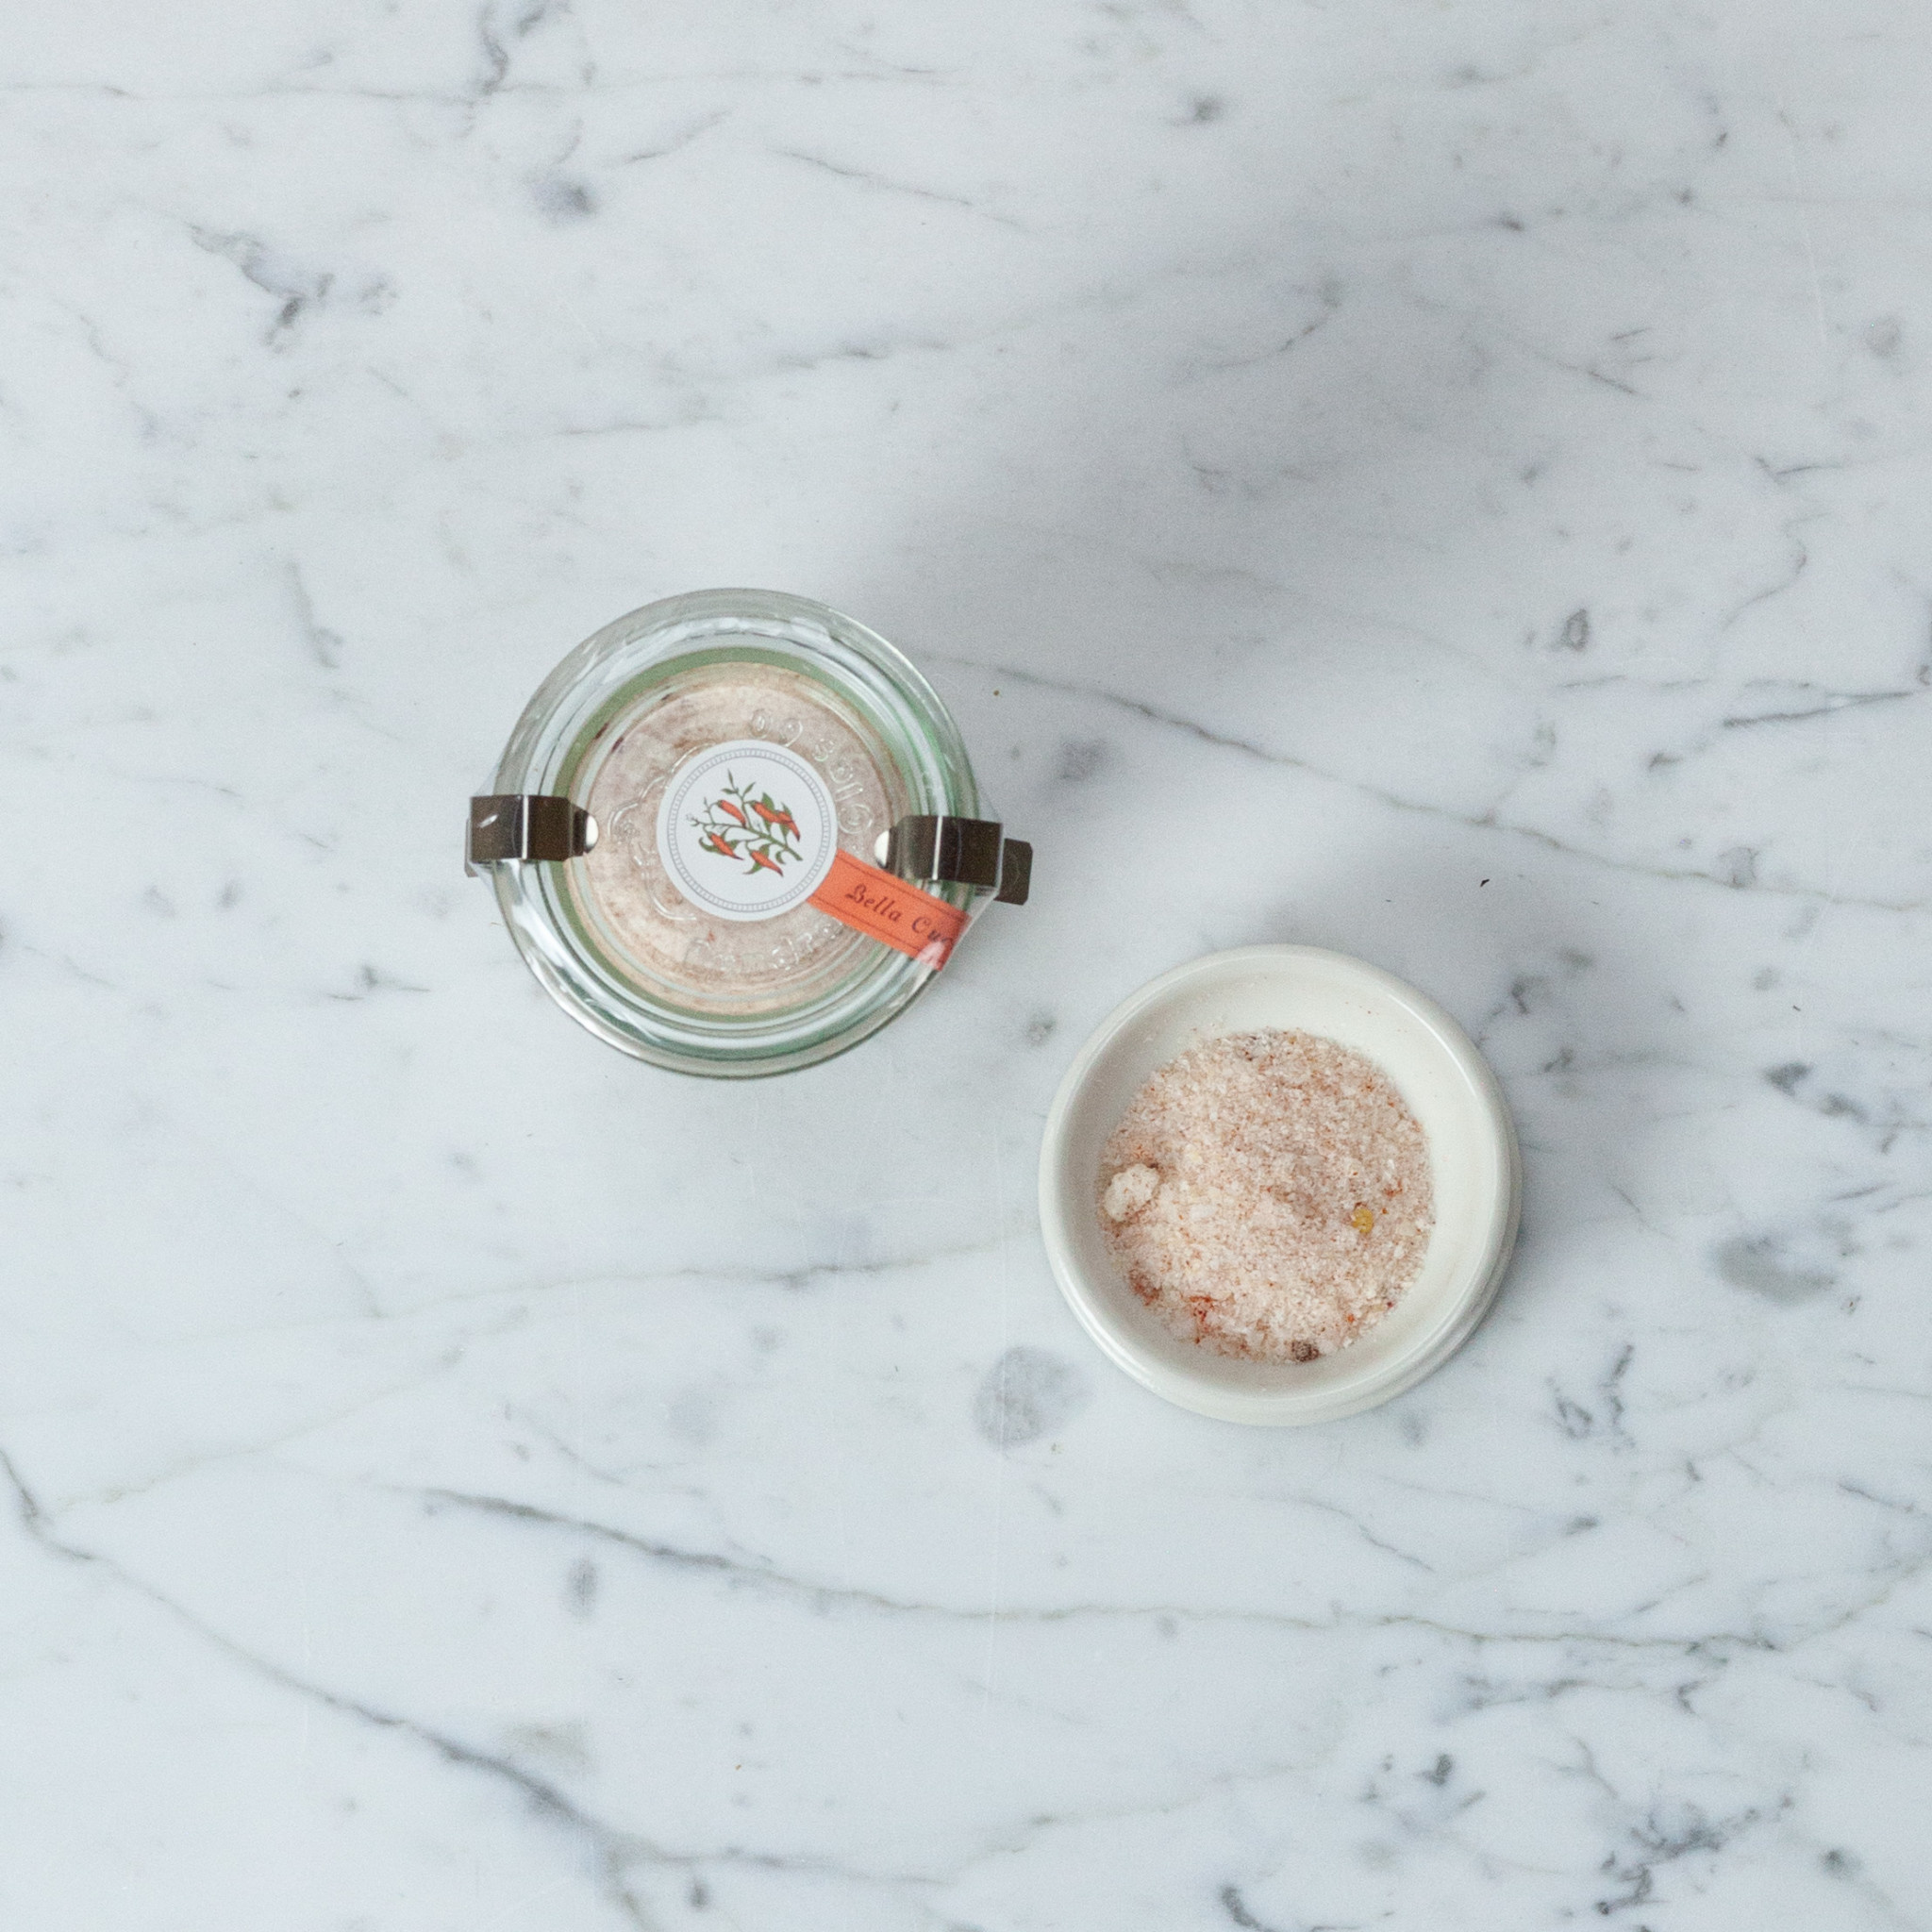 Bella Cucina Peperoncini + Pimenton Savory Salt in WECK Jar - 2.6oz